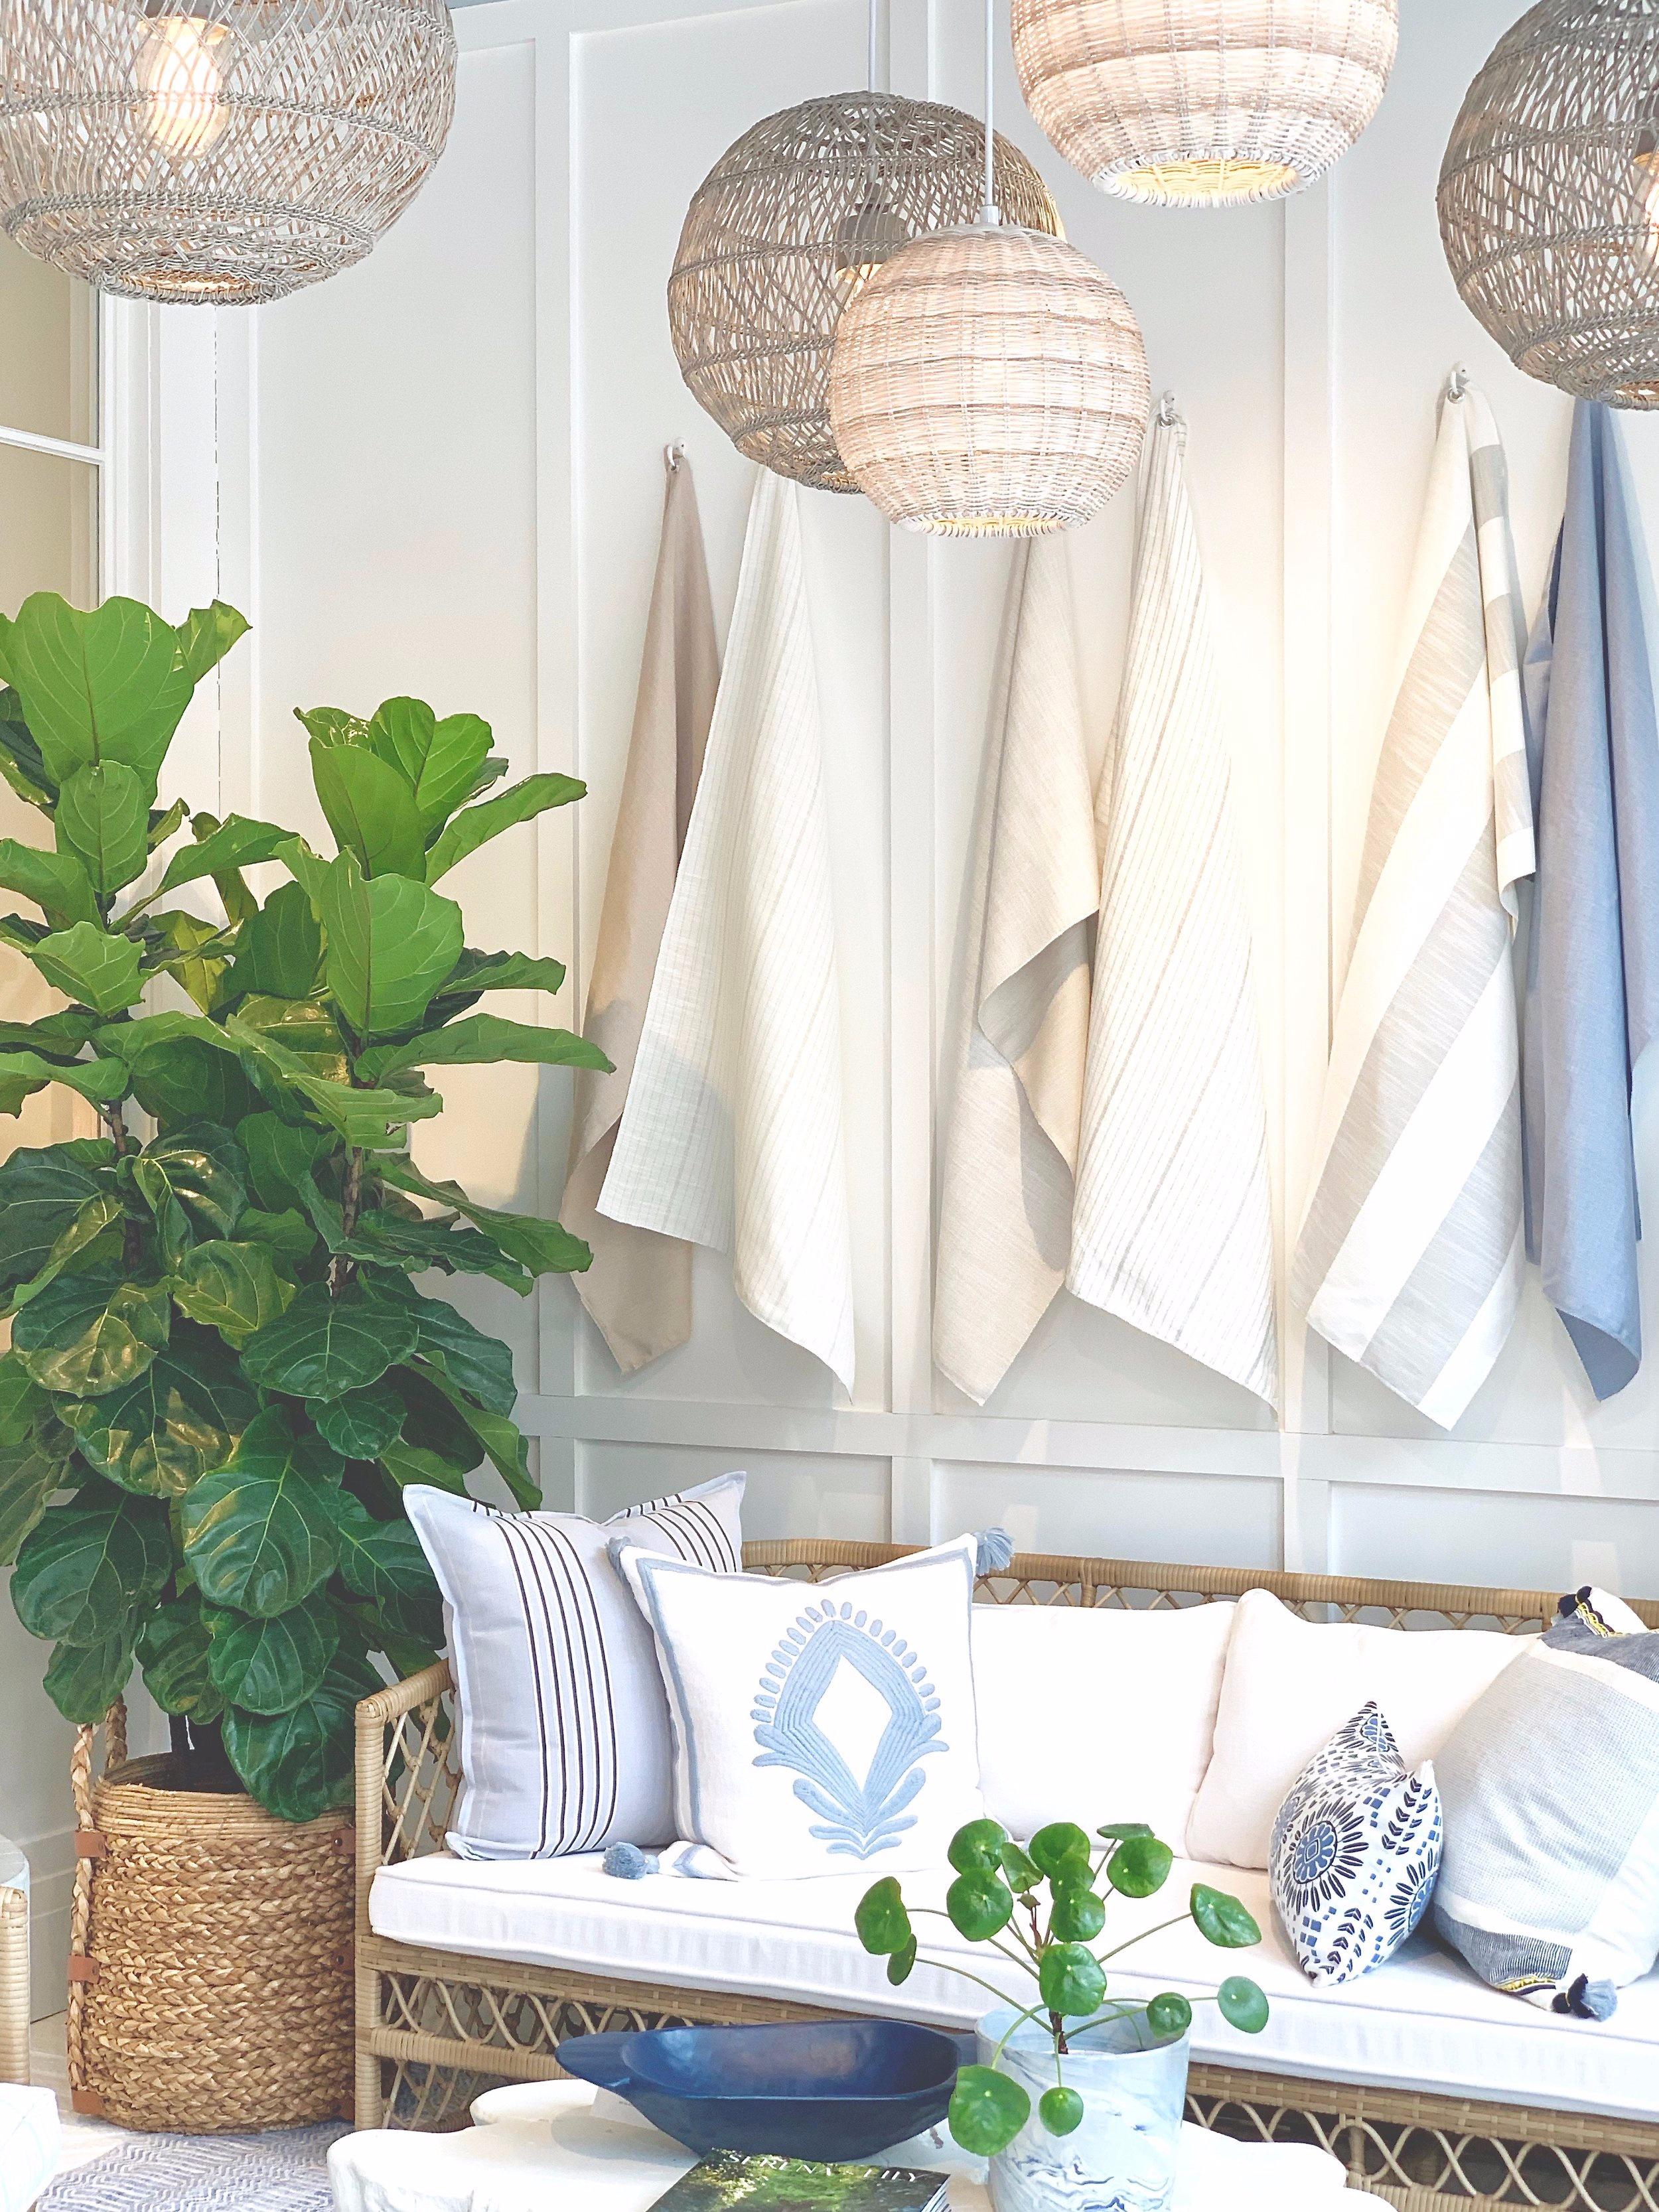 serena+and+lily+beachy+light+fixtures%2C+rattan+sofa%2C+thephasethreehome.com++.jpg